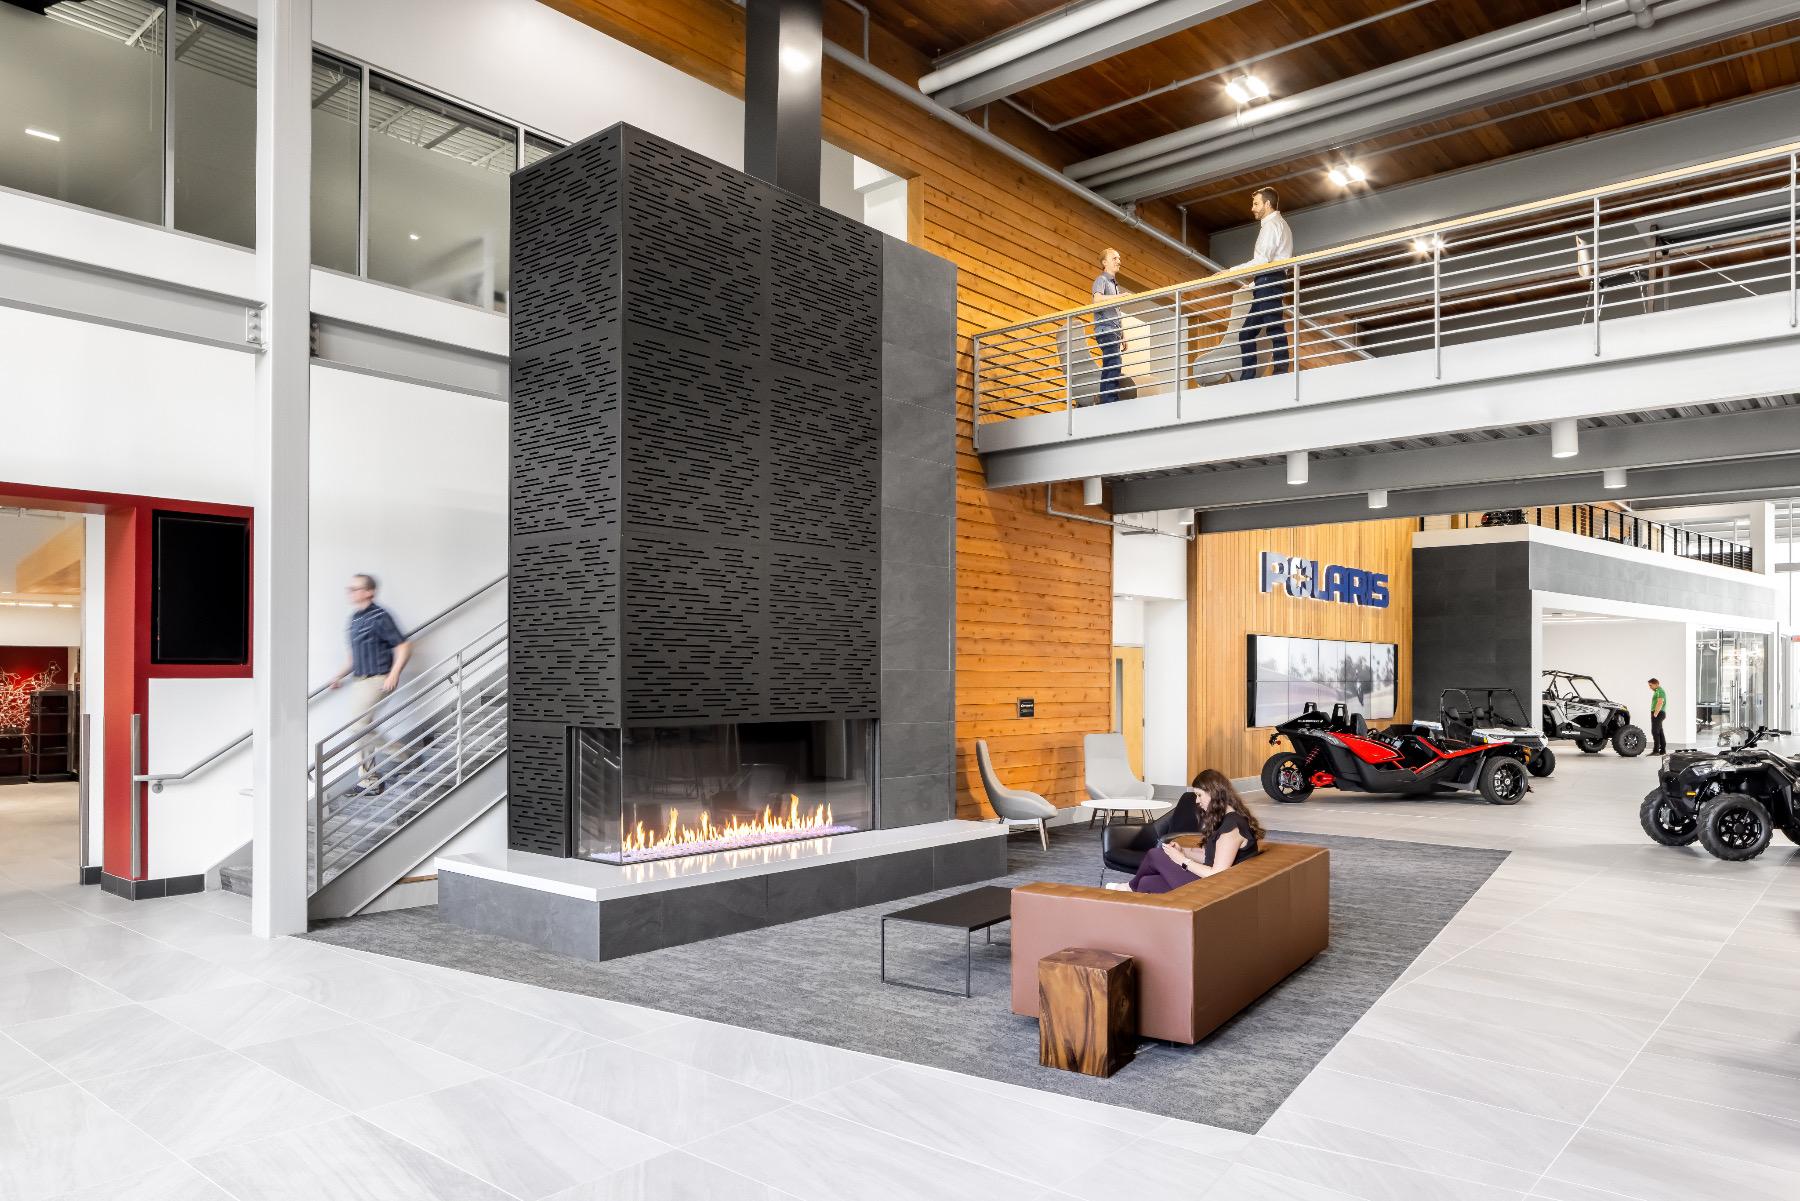 A Look Inside Polaris' New Medina Office